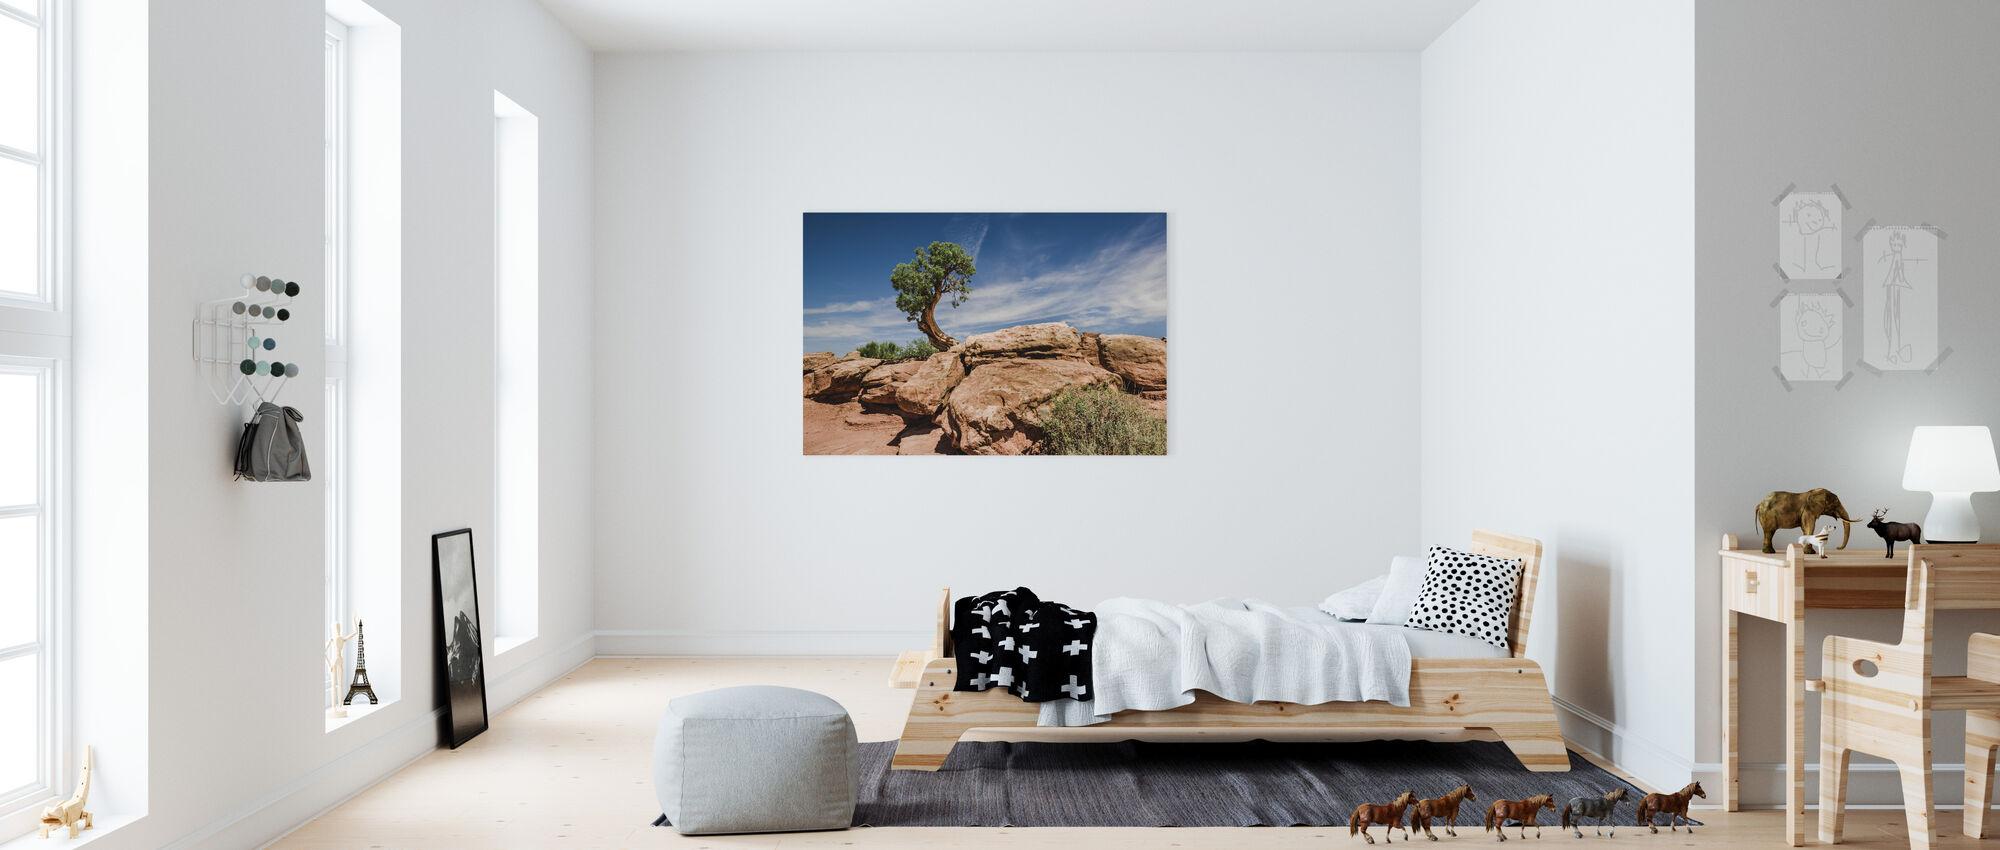 Aavikko puu Utahissa - Canvastaulu - Lastenhuone